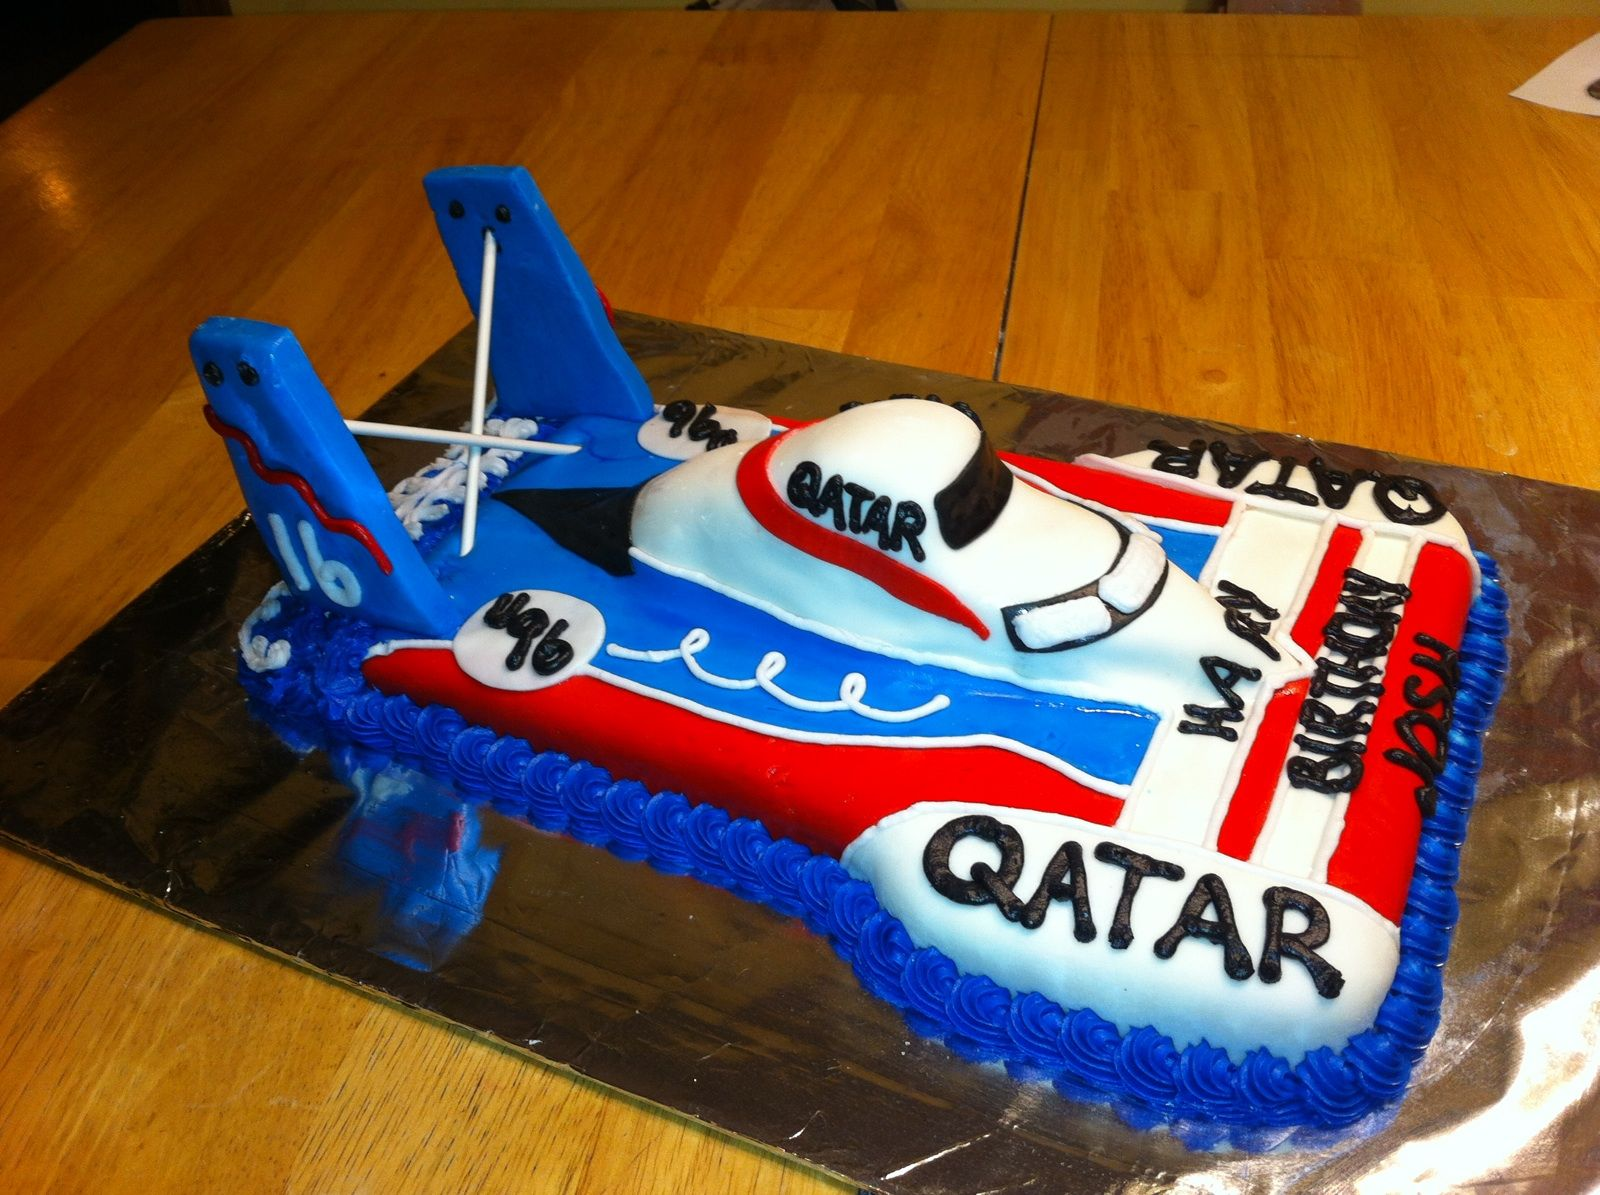 Racing Boat Birthday Cake Cake Diva Cakes Pinterest Birthday - Boat birthday cake ideas